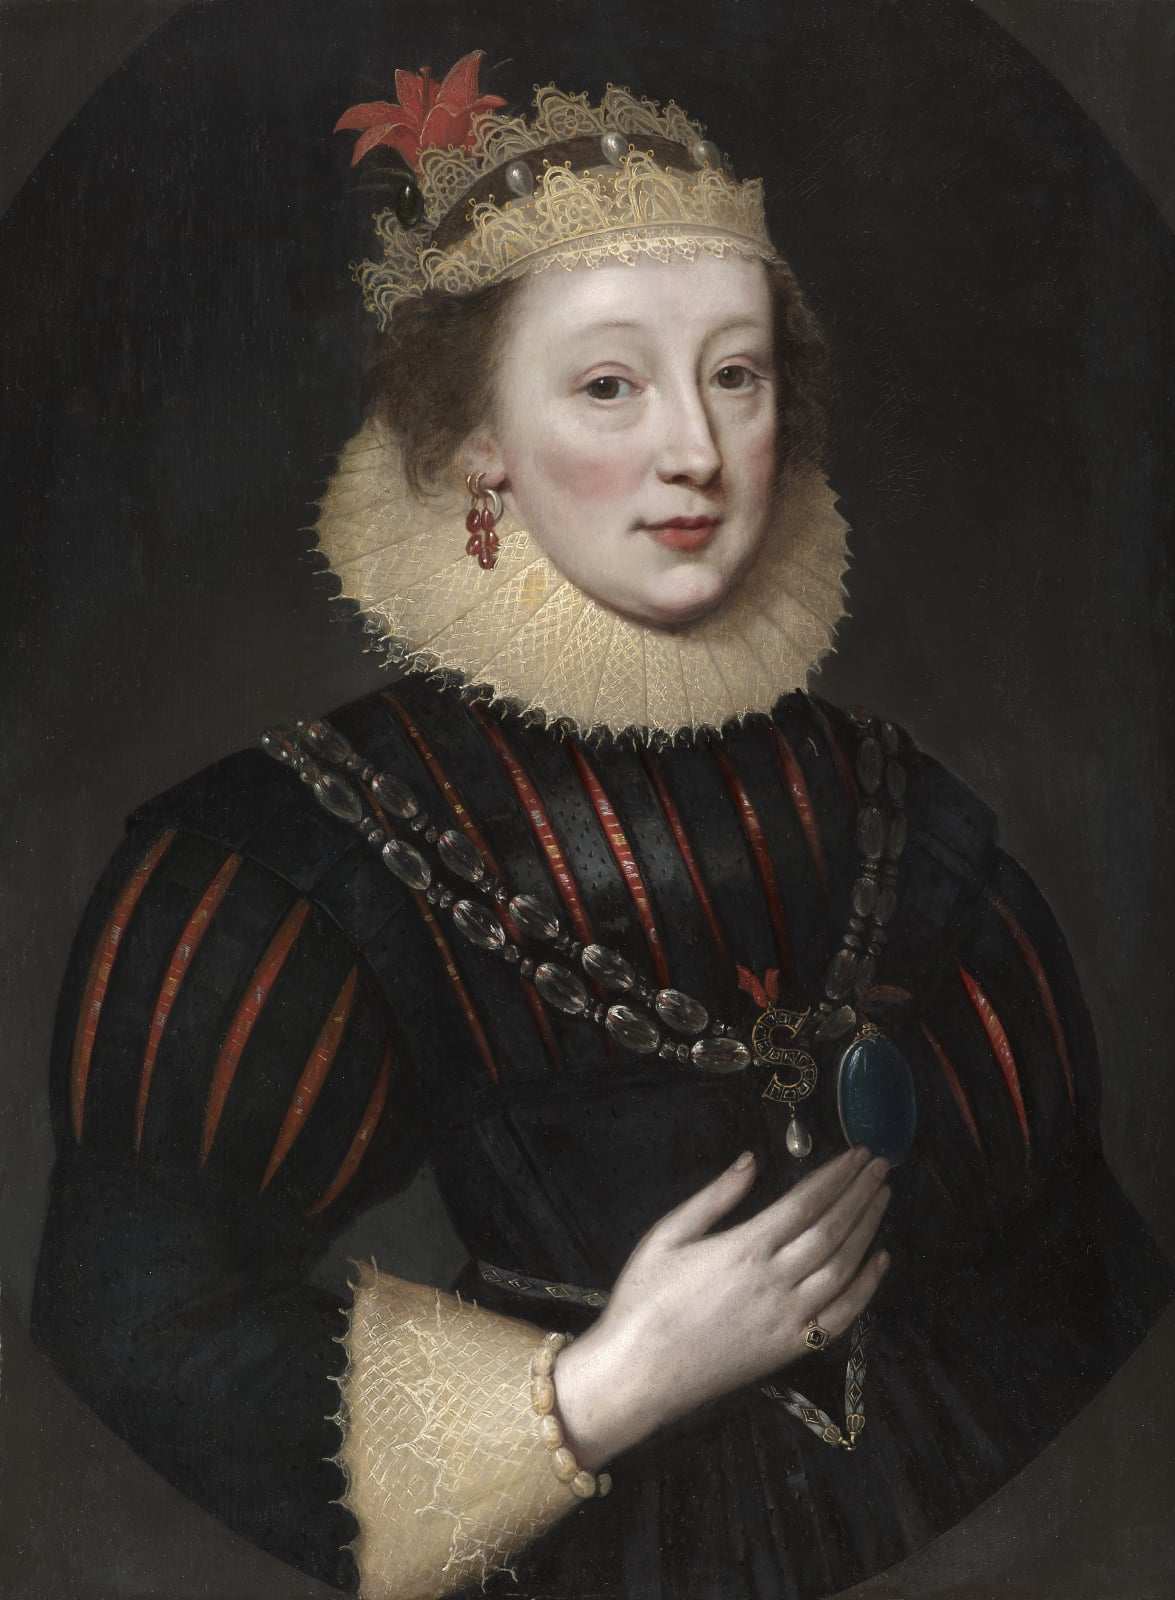 Elizabeth Wriothesley, née Vernon, Countess of Southampton  (1573 – c. 1655)